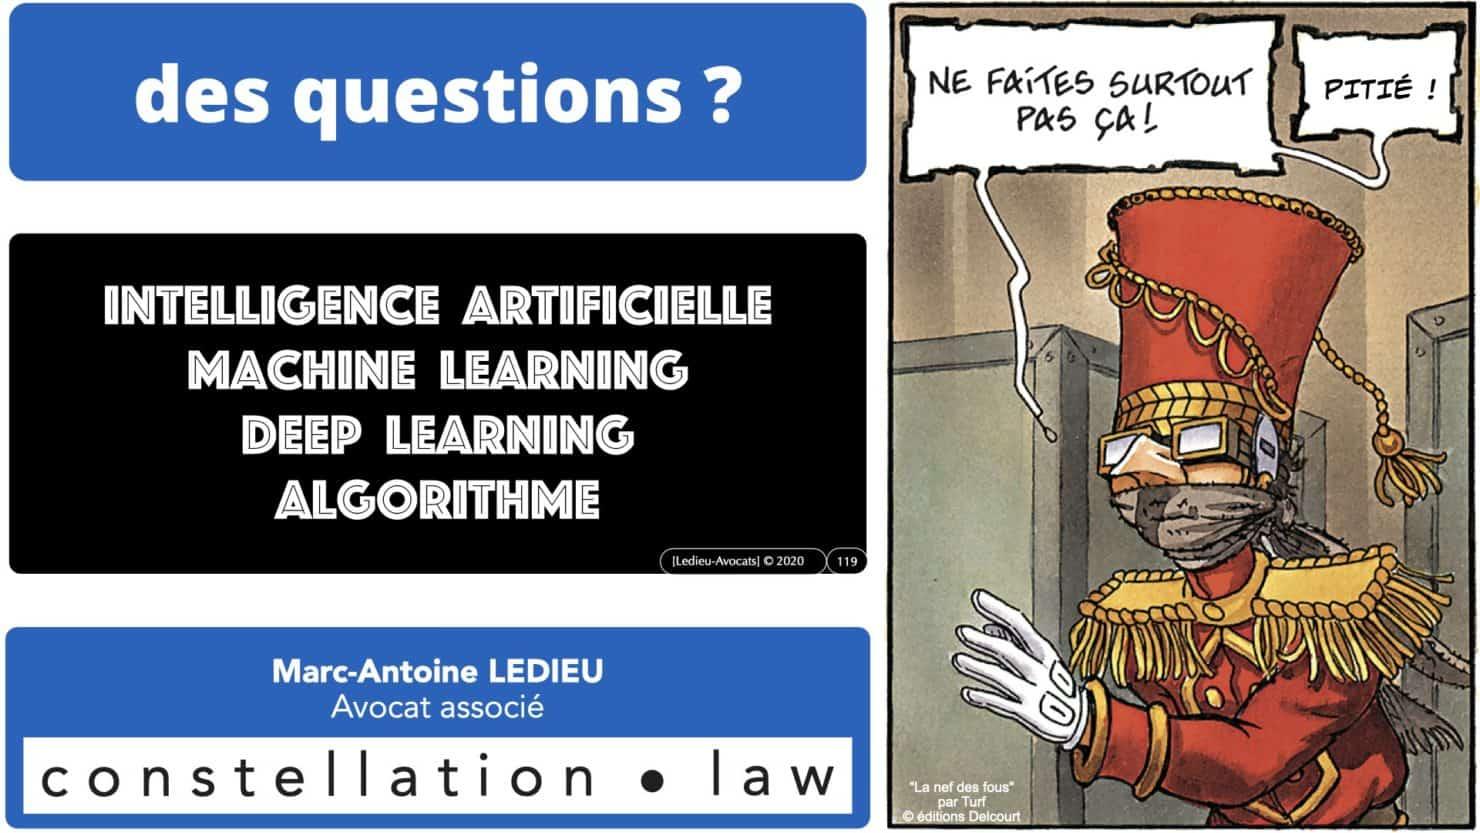 307 Intelligence artificielle-machine-learning-deep-learning-base de données-BIG-DATA *16:9* Constellation ©Ledieu-Avocat-13-10-2020.119